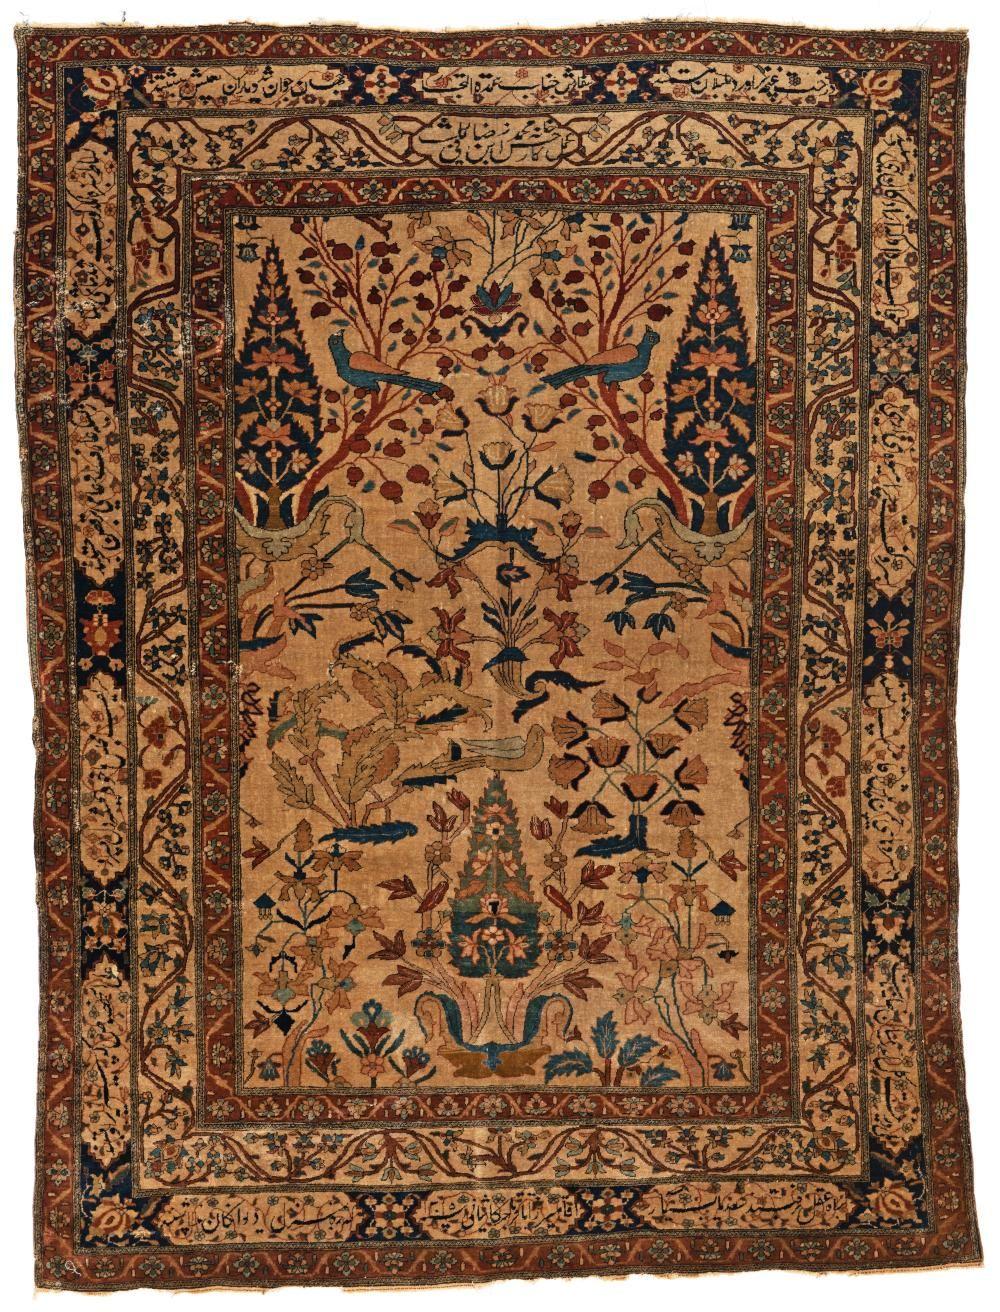 Kashan Mohtashem Antique Oriental Rugs Persia Antiques